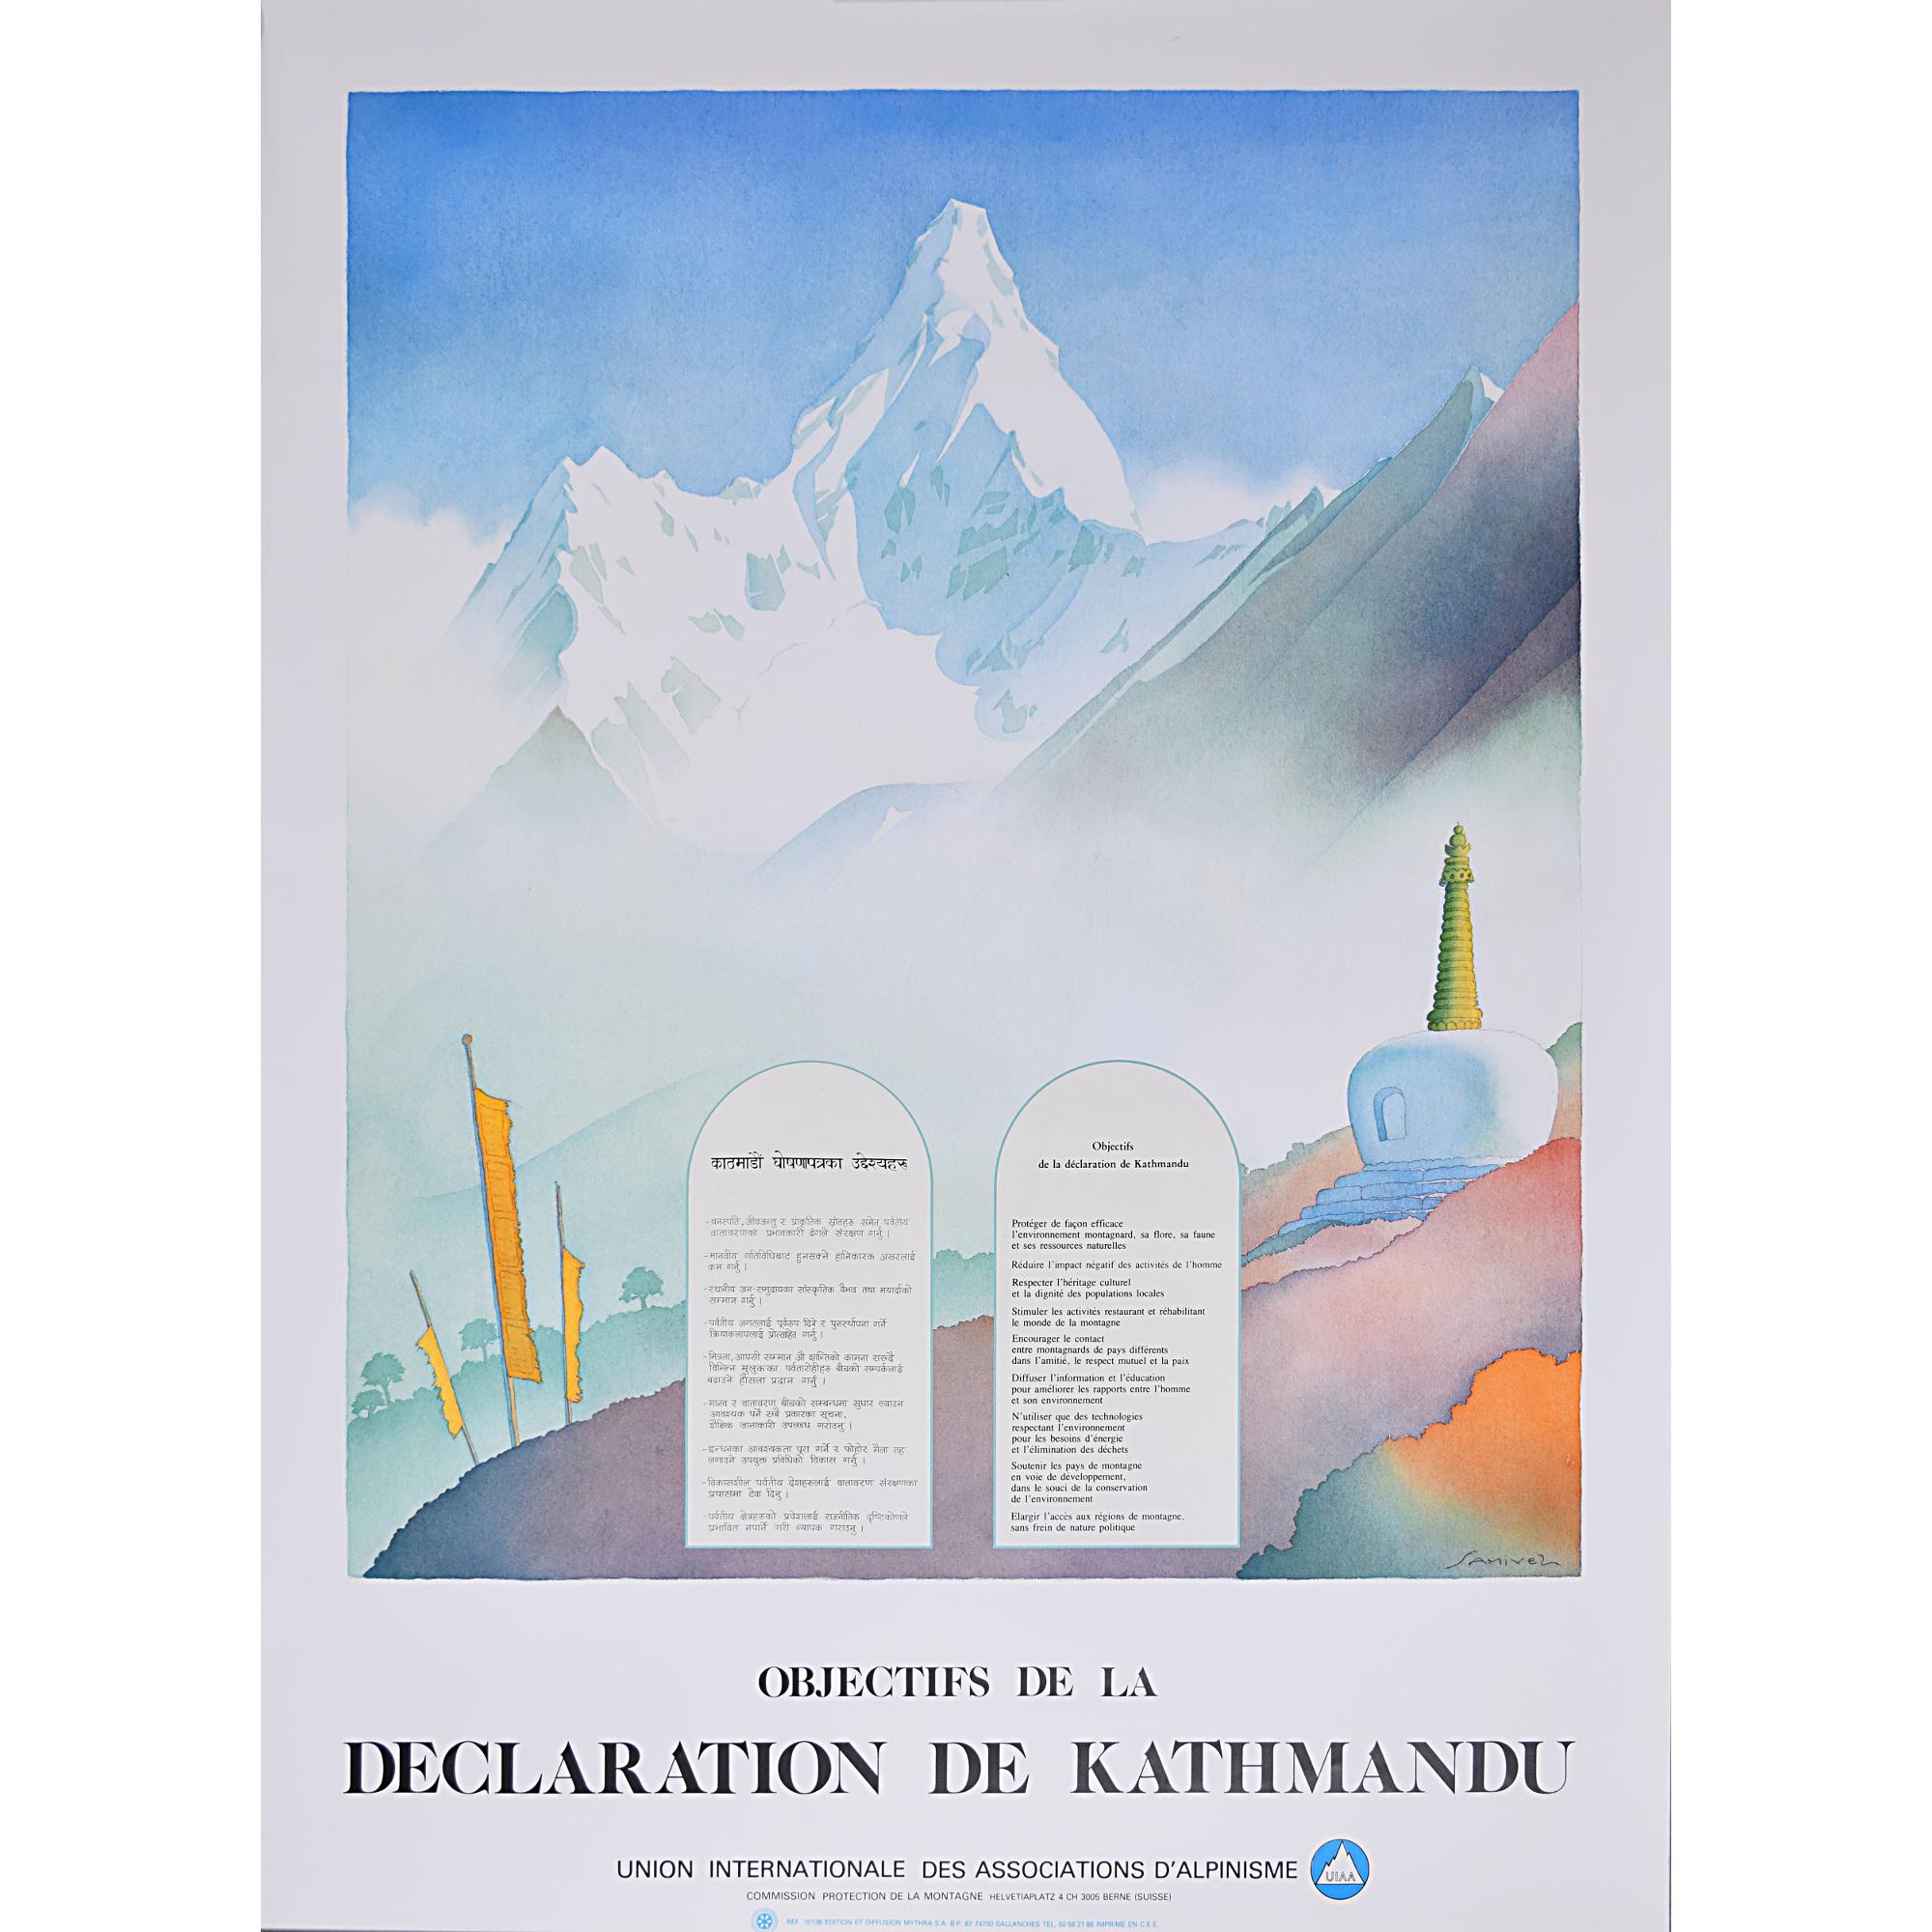 'Samivel' Paul Gayet-Tancrède, Objectives of the Kathmandu Declaration Original Poster for sale